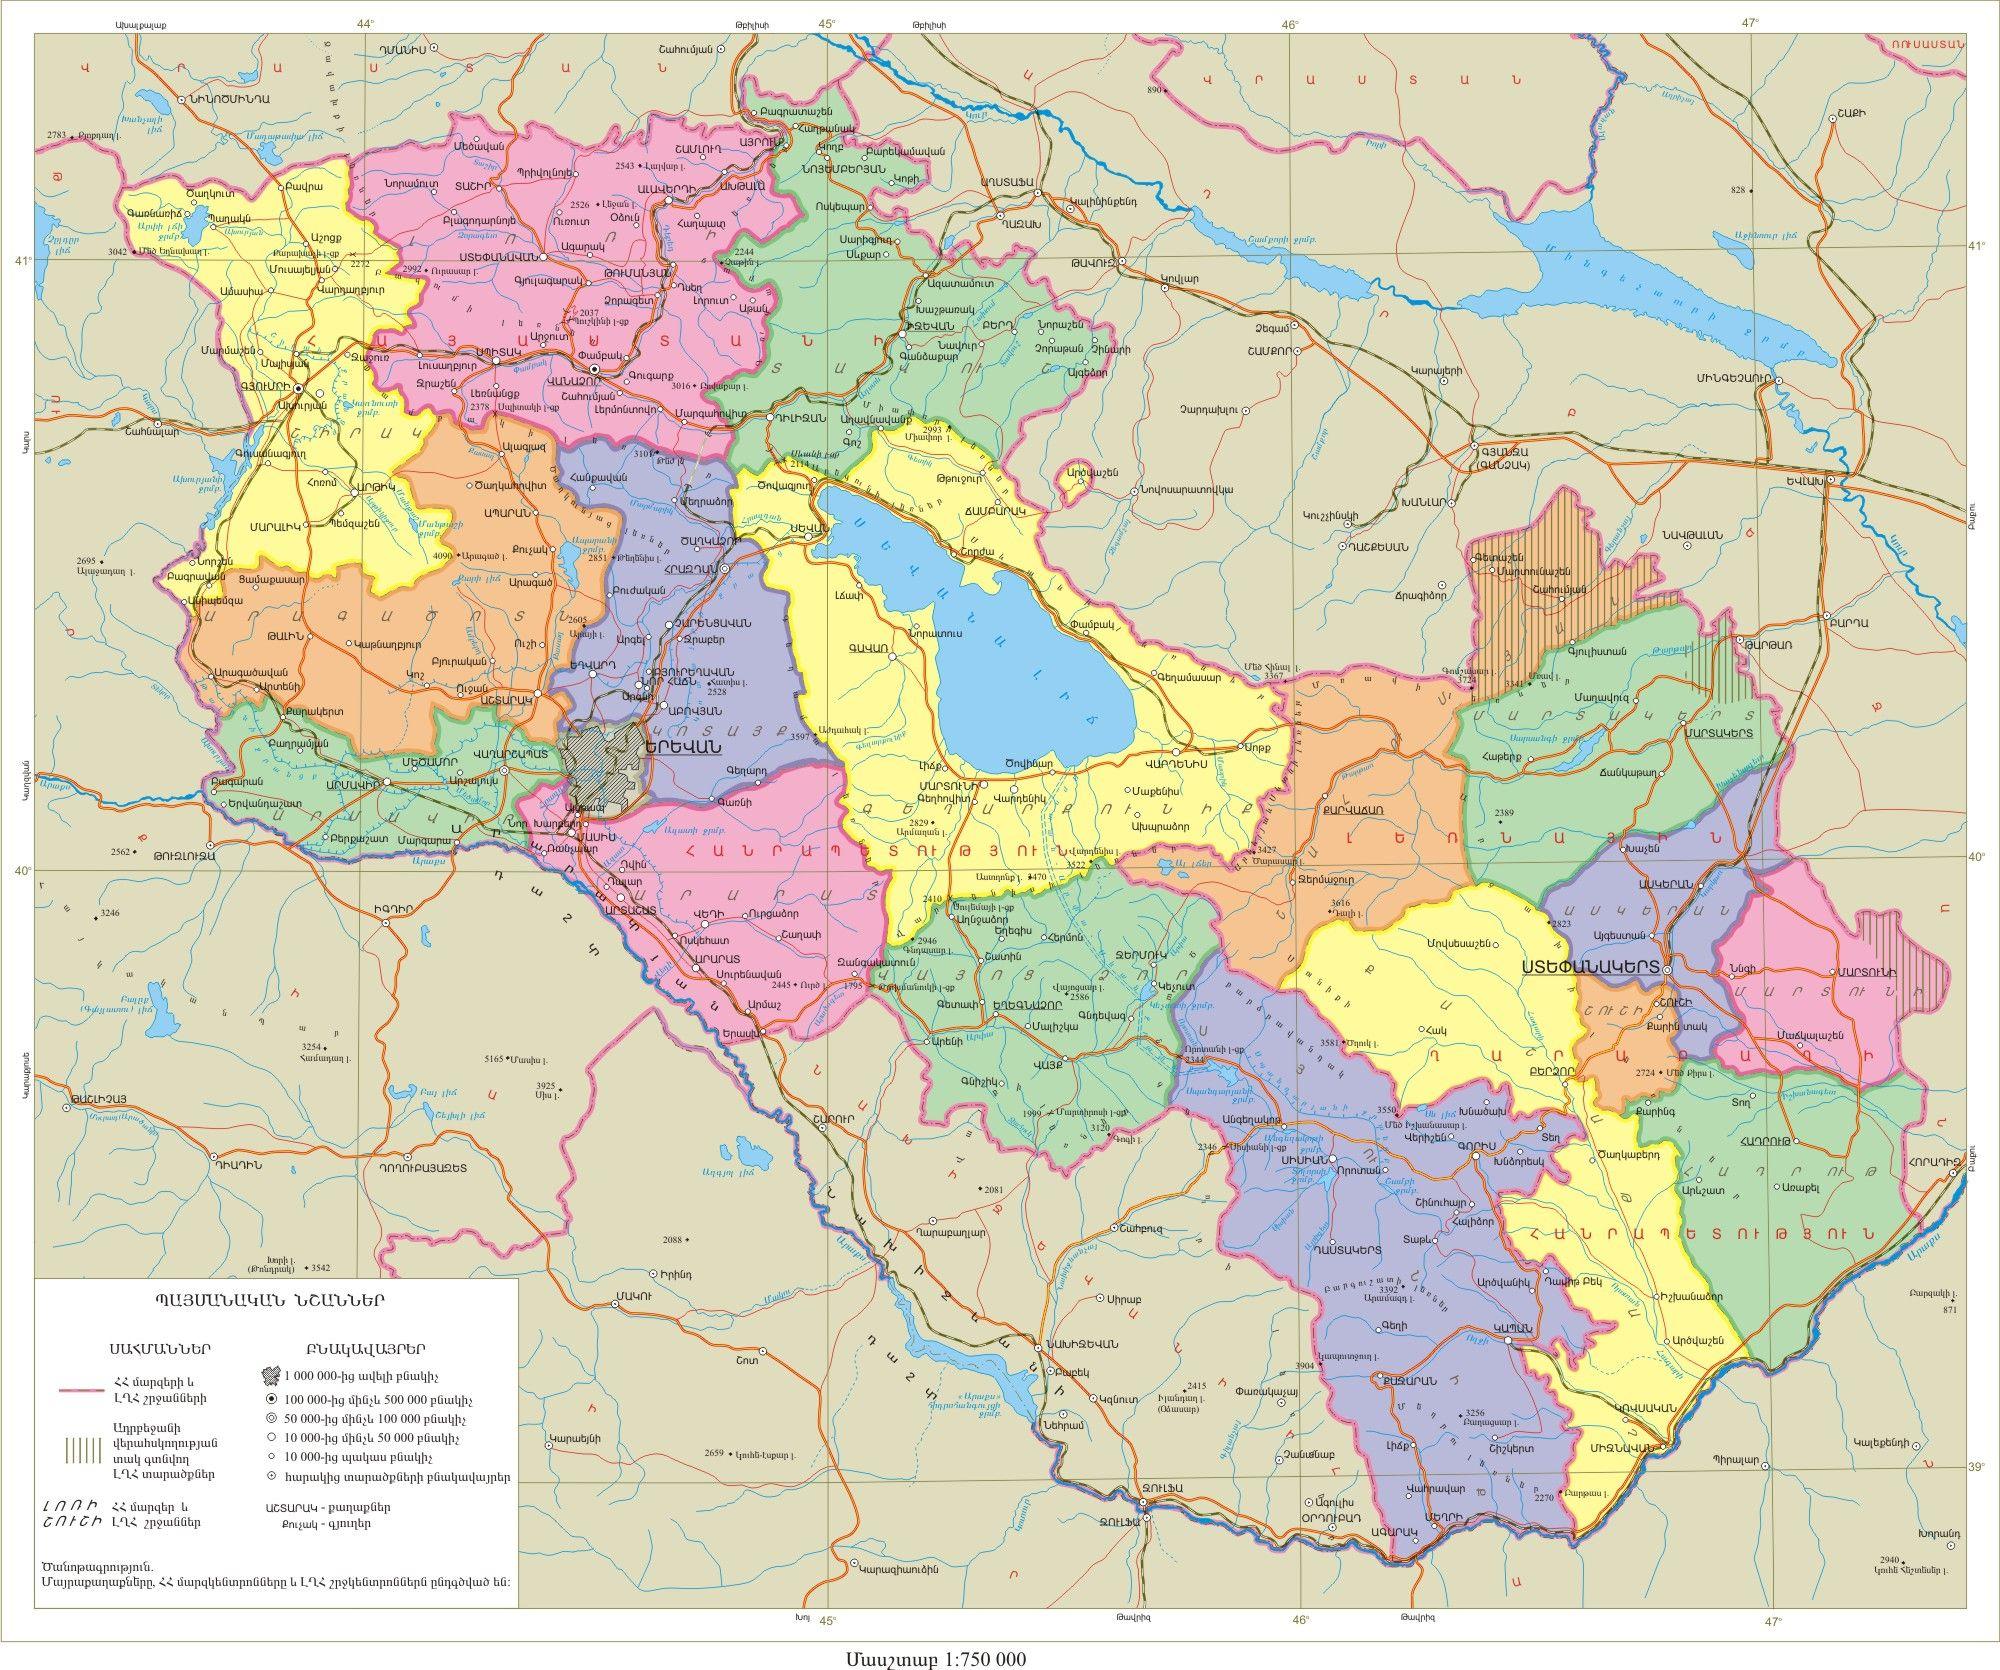 Armenia and Karabakh httpenwikipediaorgwikiArmenia